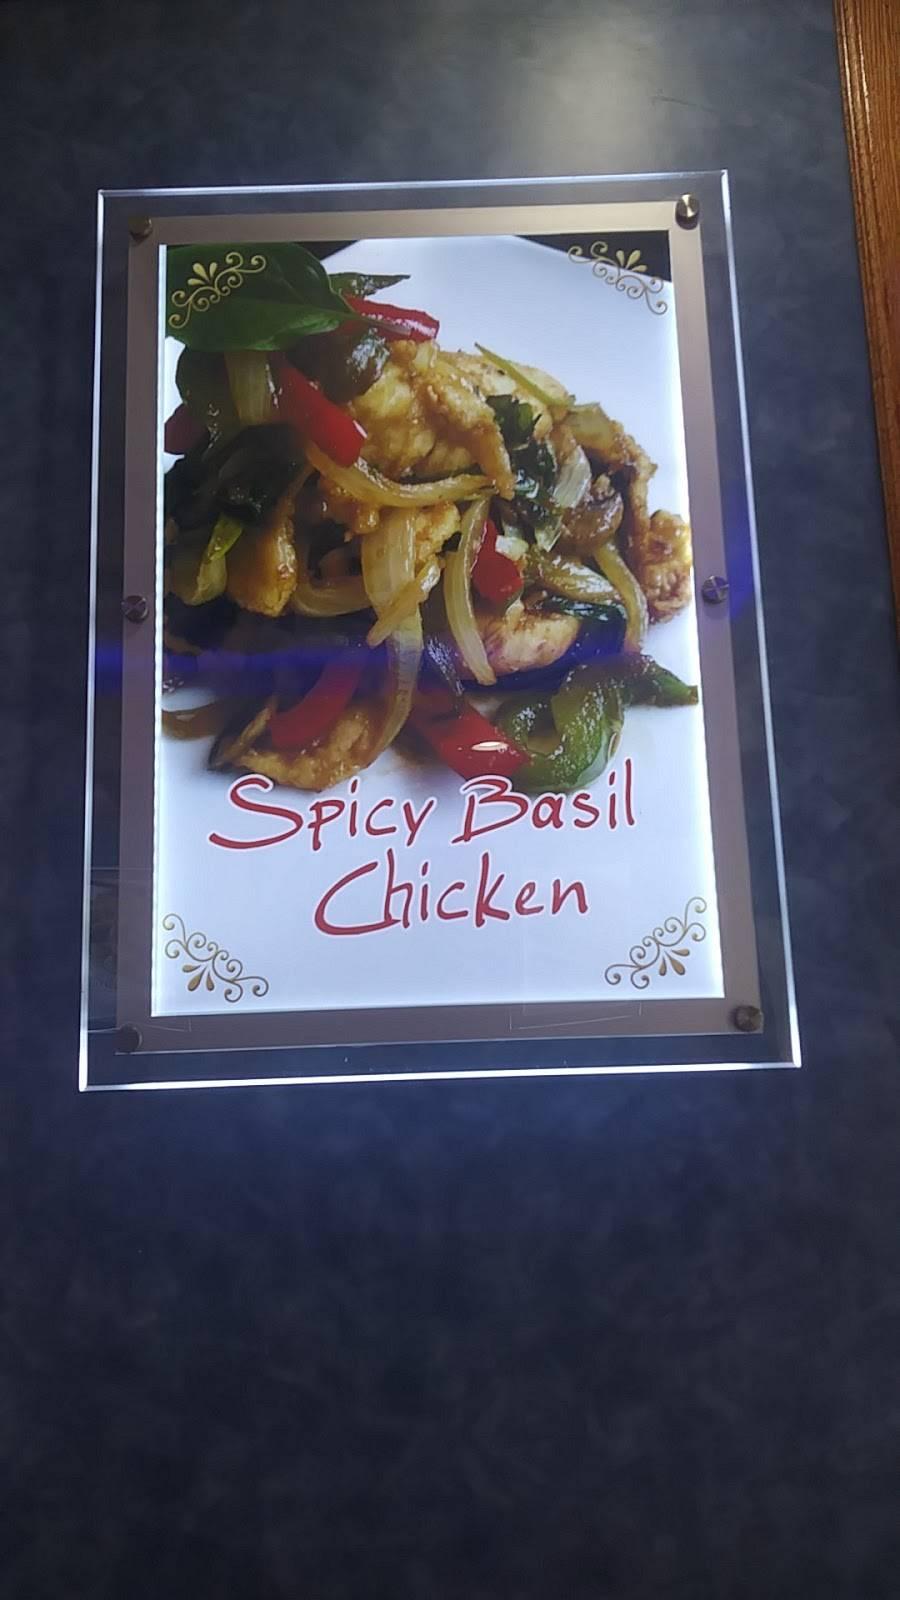 No.1 Wok | restaurant | 260 Cypress Ave, Bronx, NY 邮政编码: 10454, USA | 7184028215 OR +1 718-402-8215